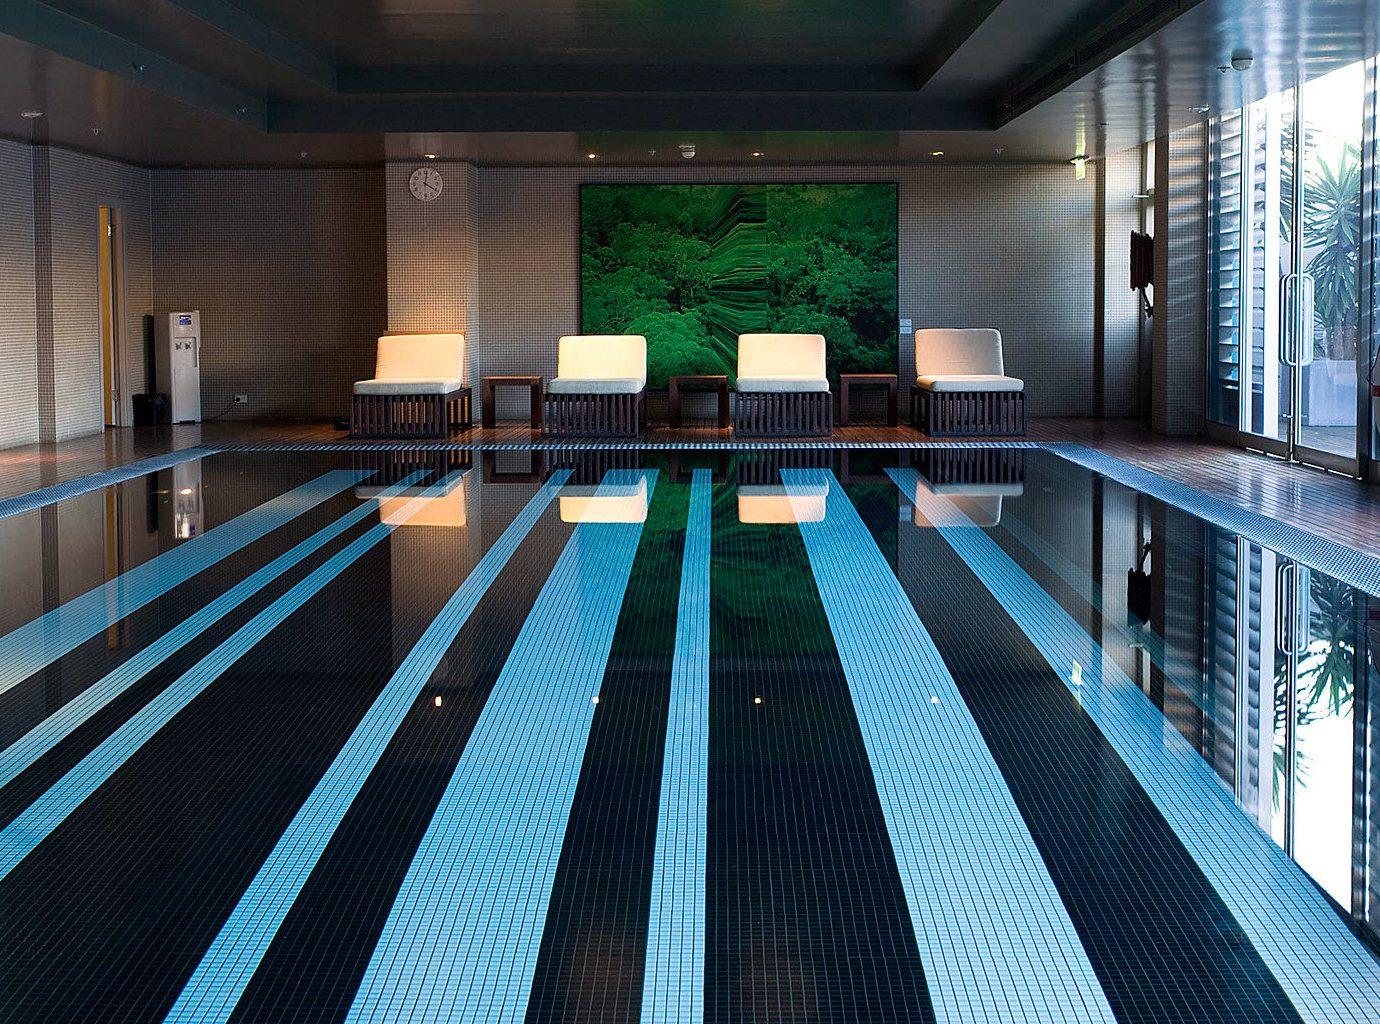 All-Inclusive Resorts Boutique Hotels Fitness Hotels Pool Romance Sport Wellness indoor room ceiling swimming pool interior design recreation room Design platform estate